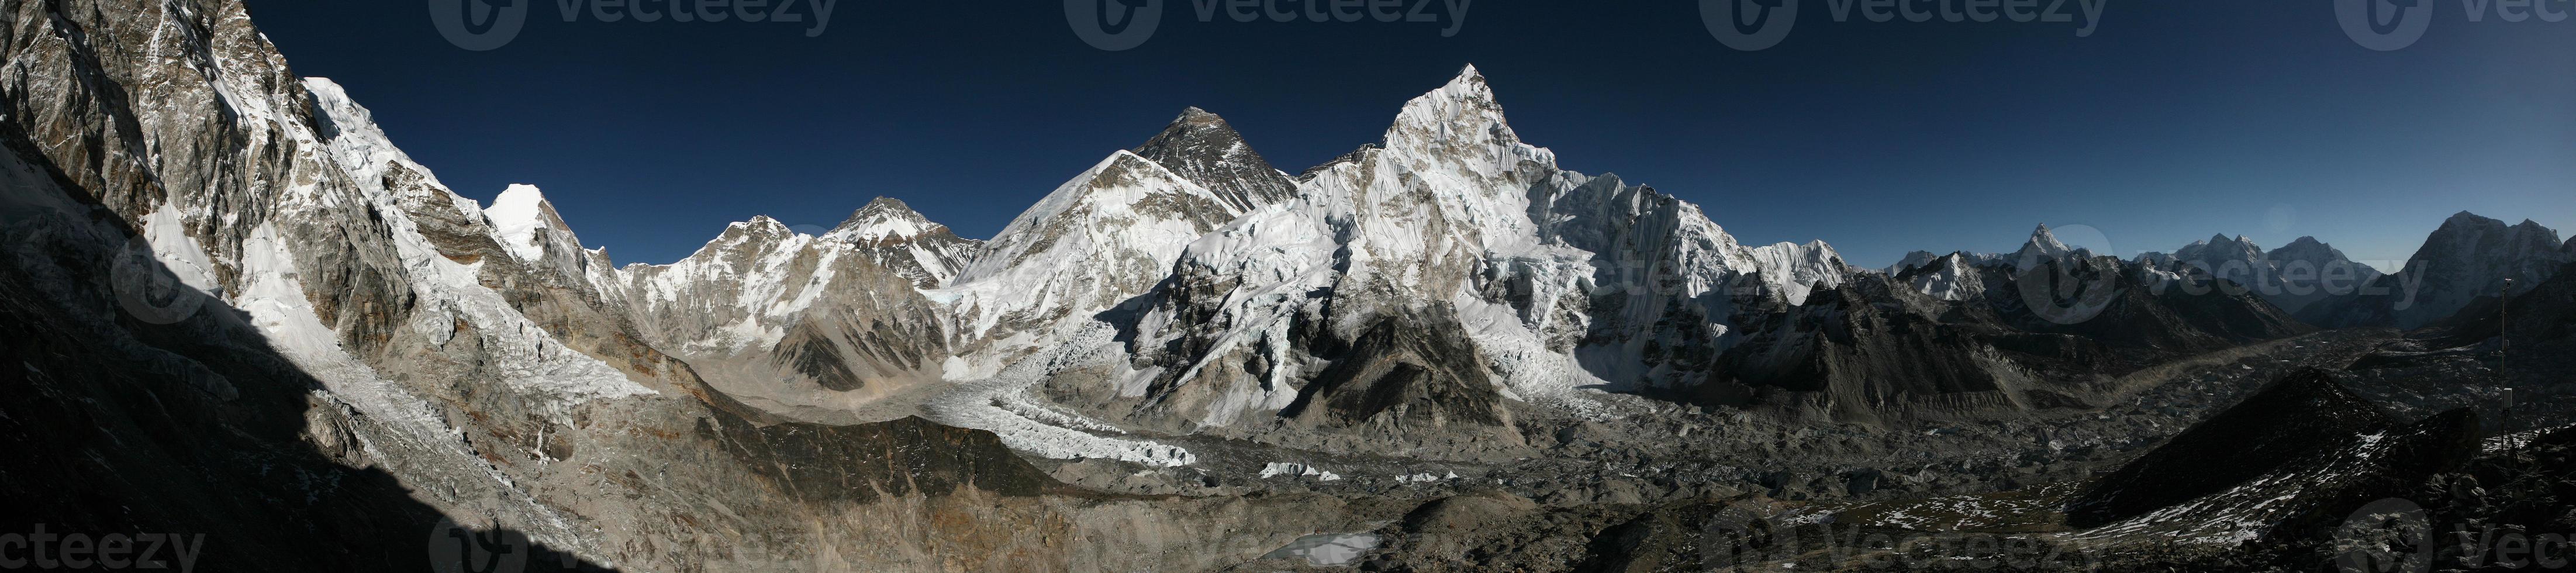 Monte Everest e a Geleira Khumbu de Kala Patthar, Himalaia foto